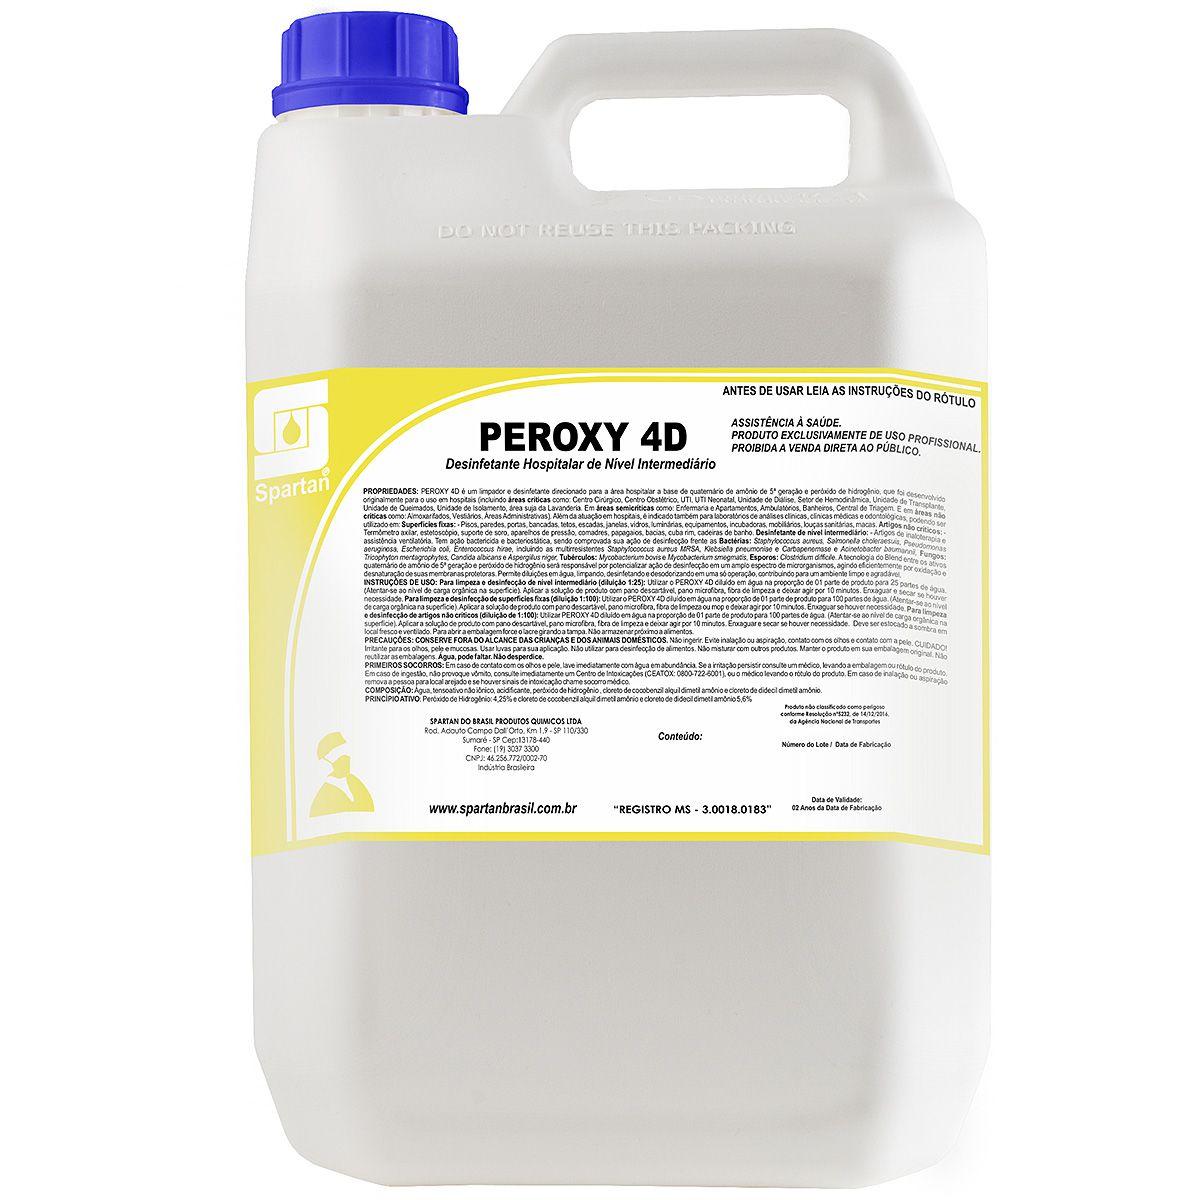 Desinfetante Hospitalar Peroxy 4D 5 Litros Spartan